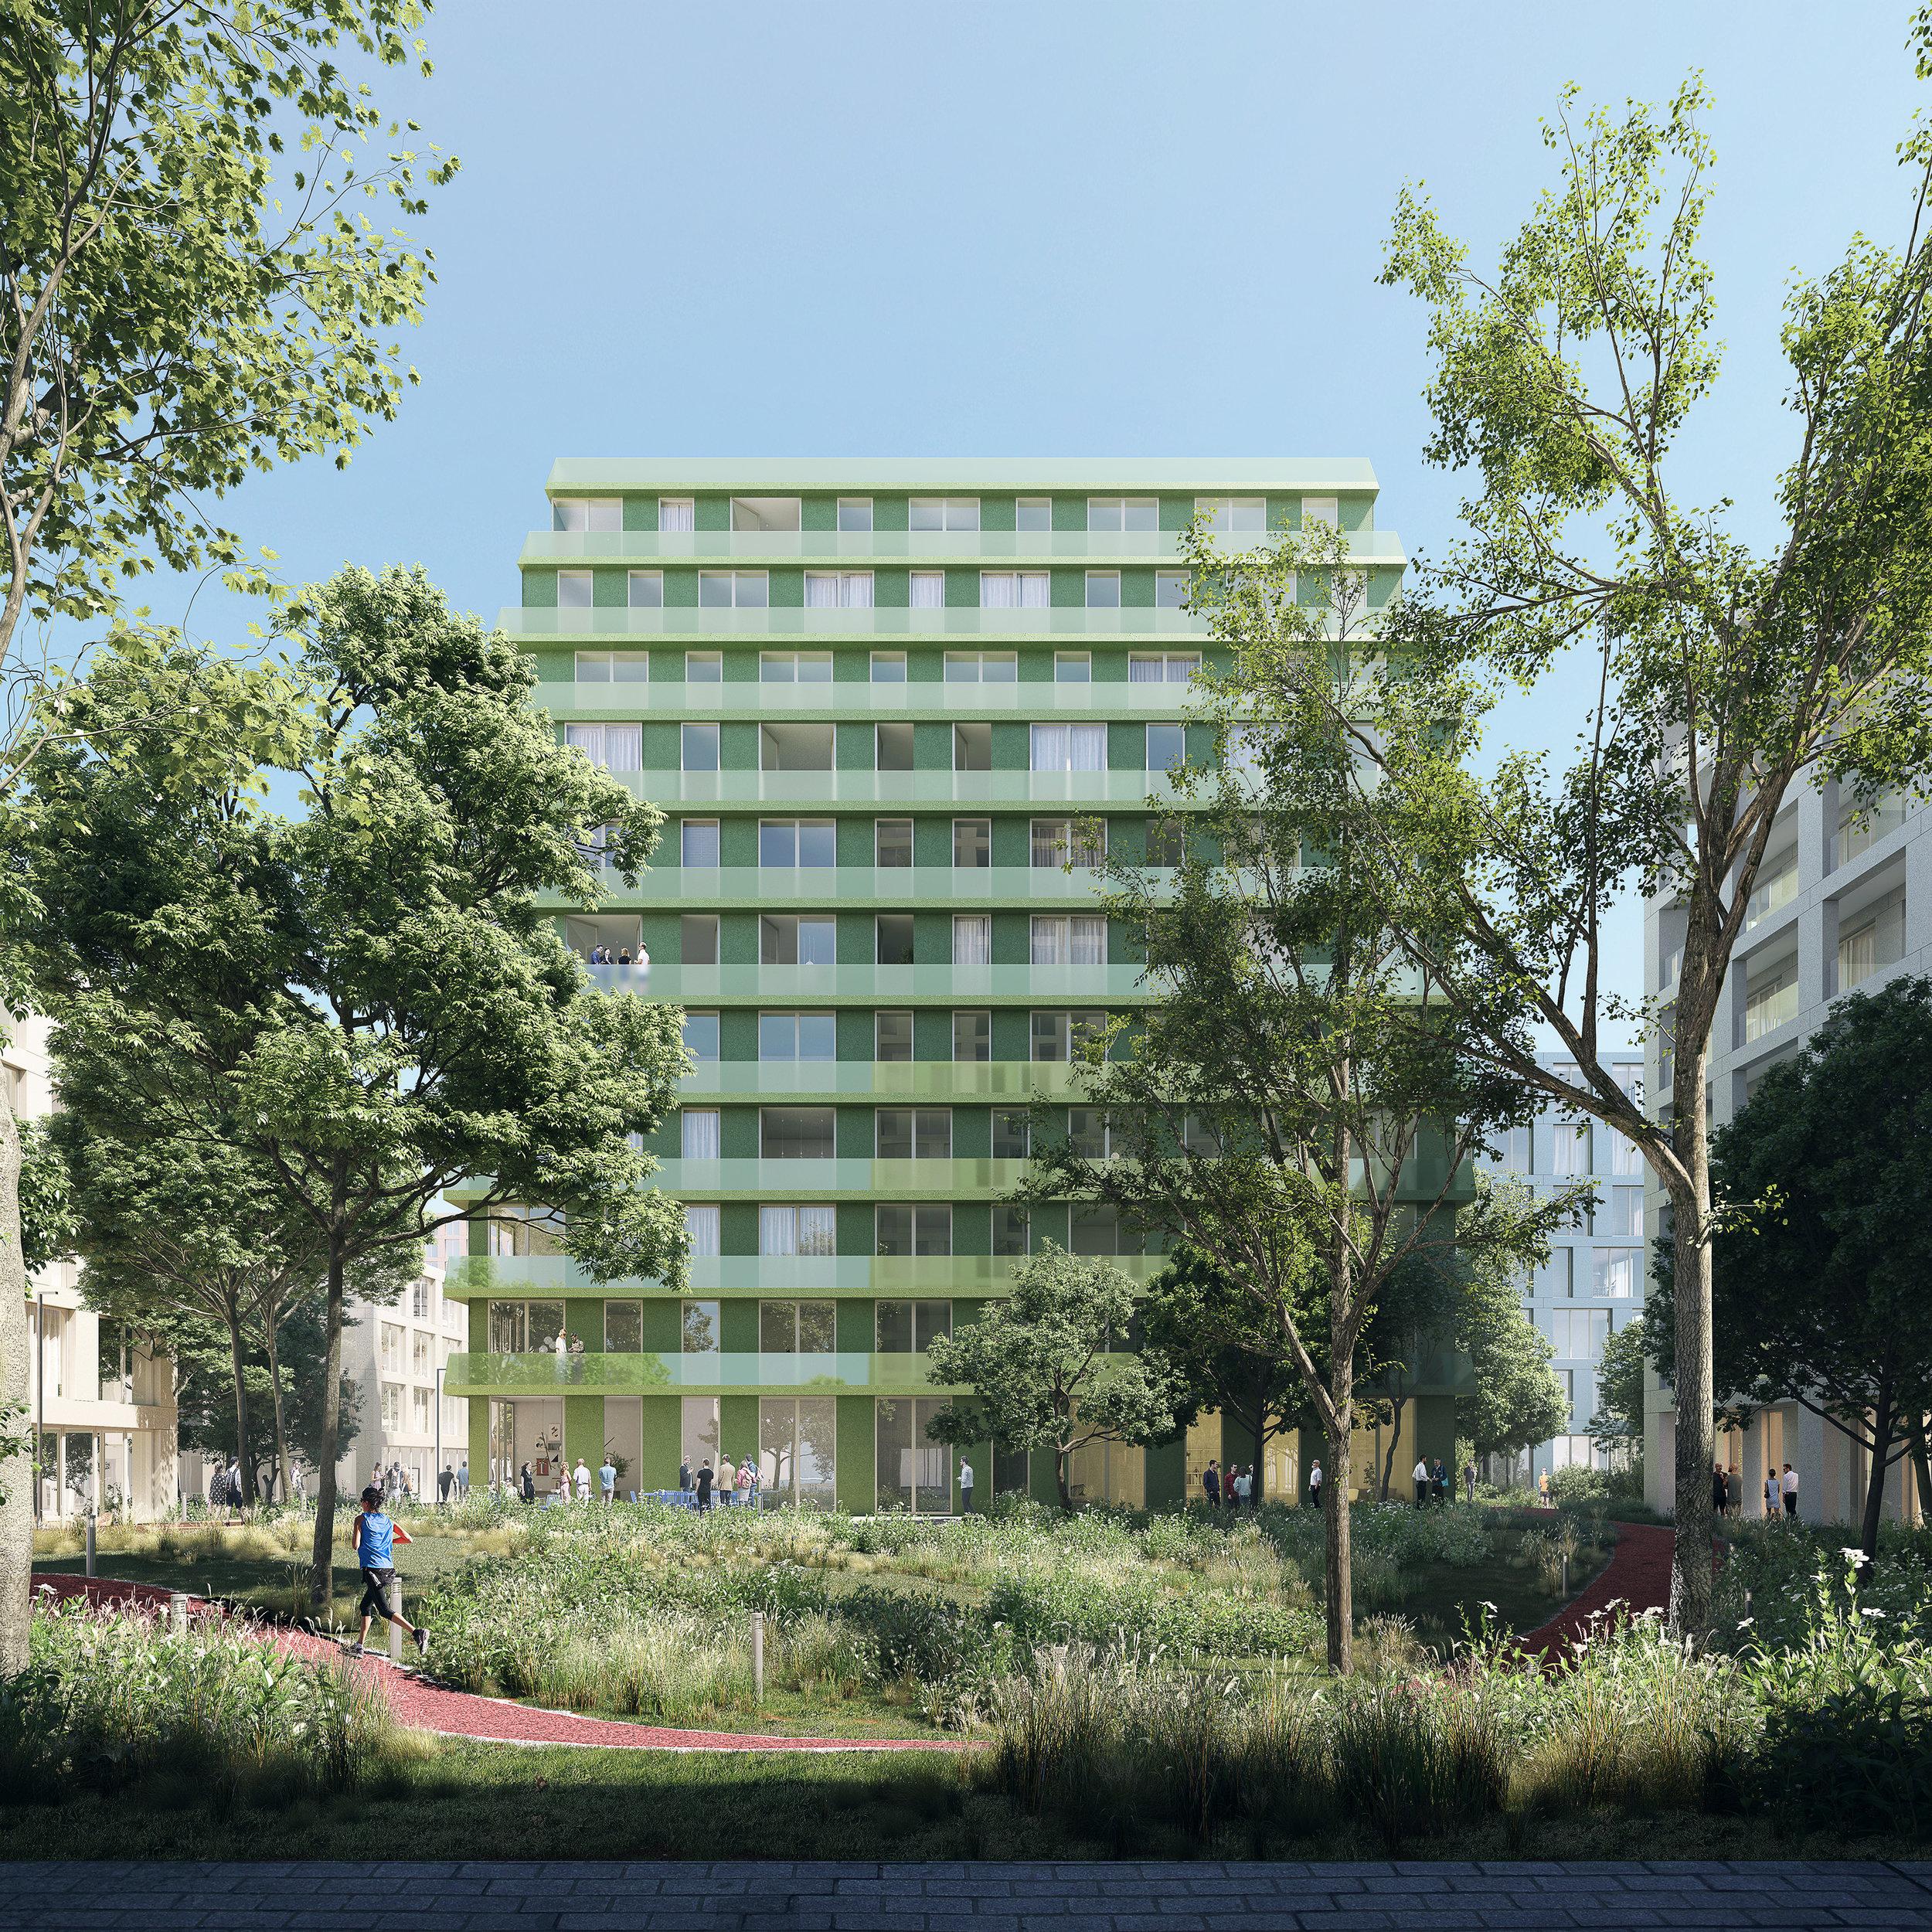 Leiden Bio Science Park. Daytime image of landscape in housing project in Leiden, Netherlands.